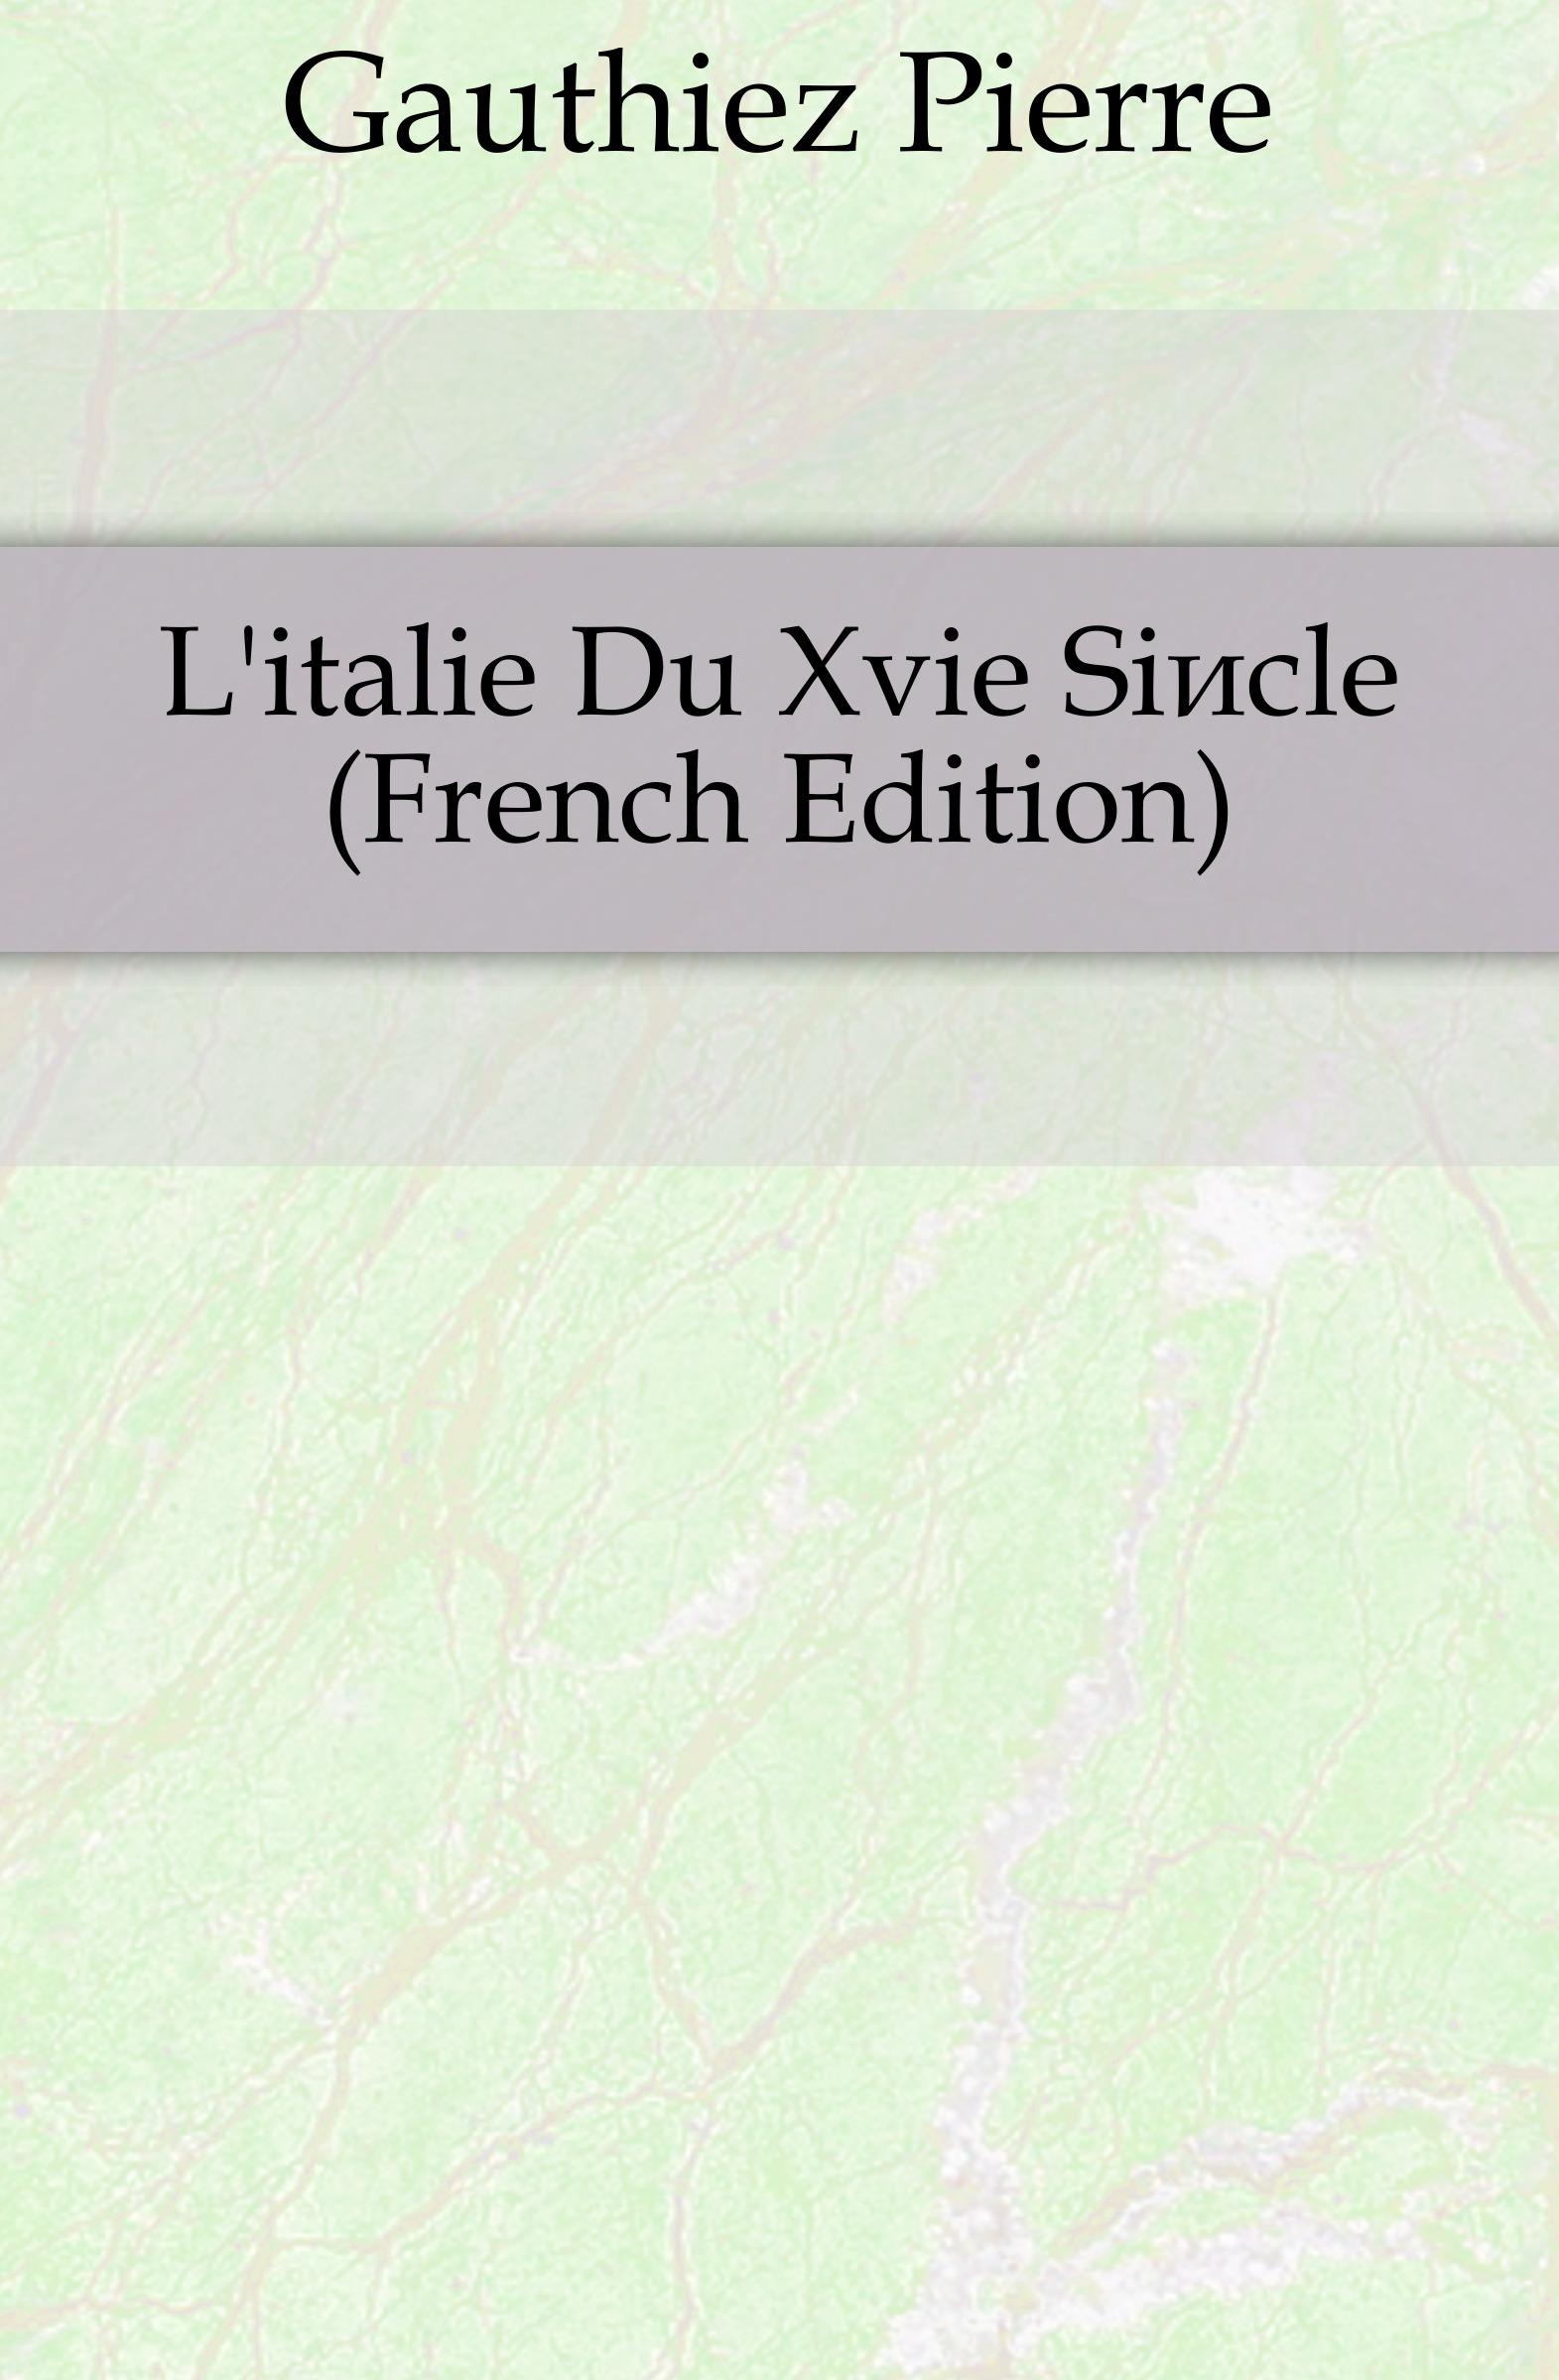 Gauthiez Pierre L.italie Du Xvie Siecle (French Edition)